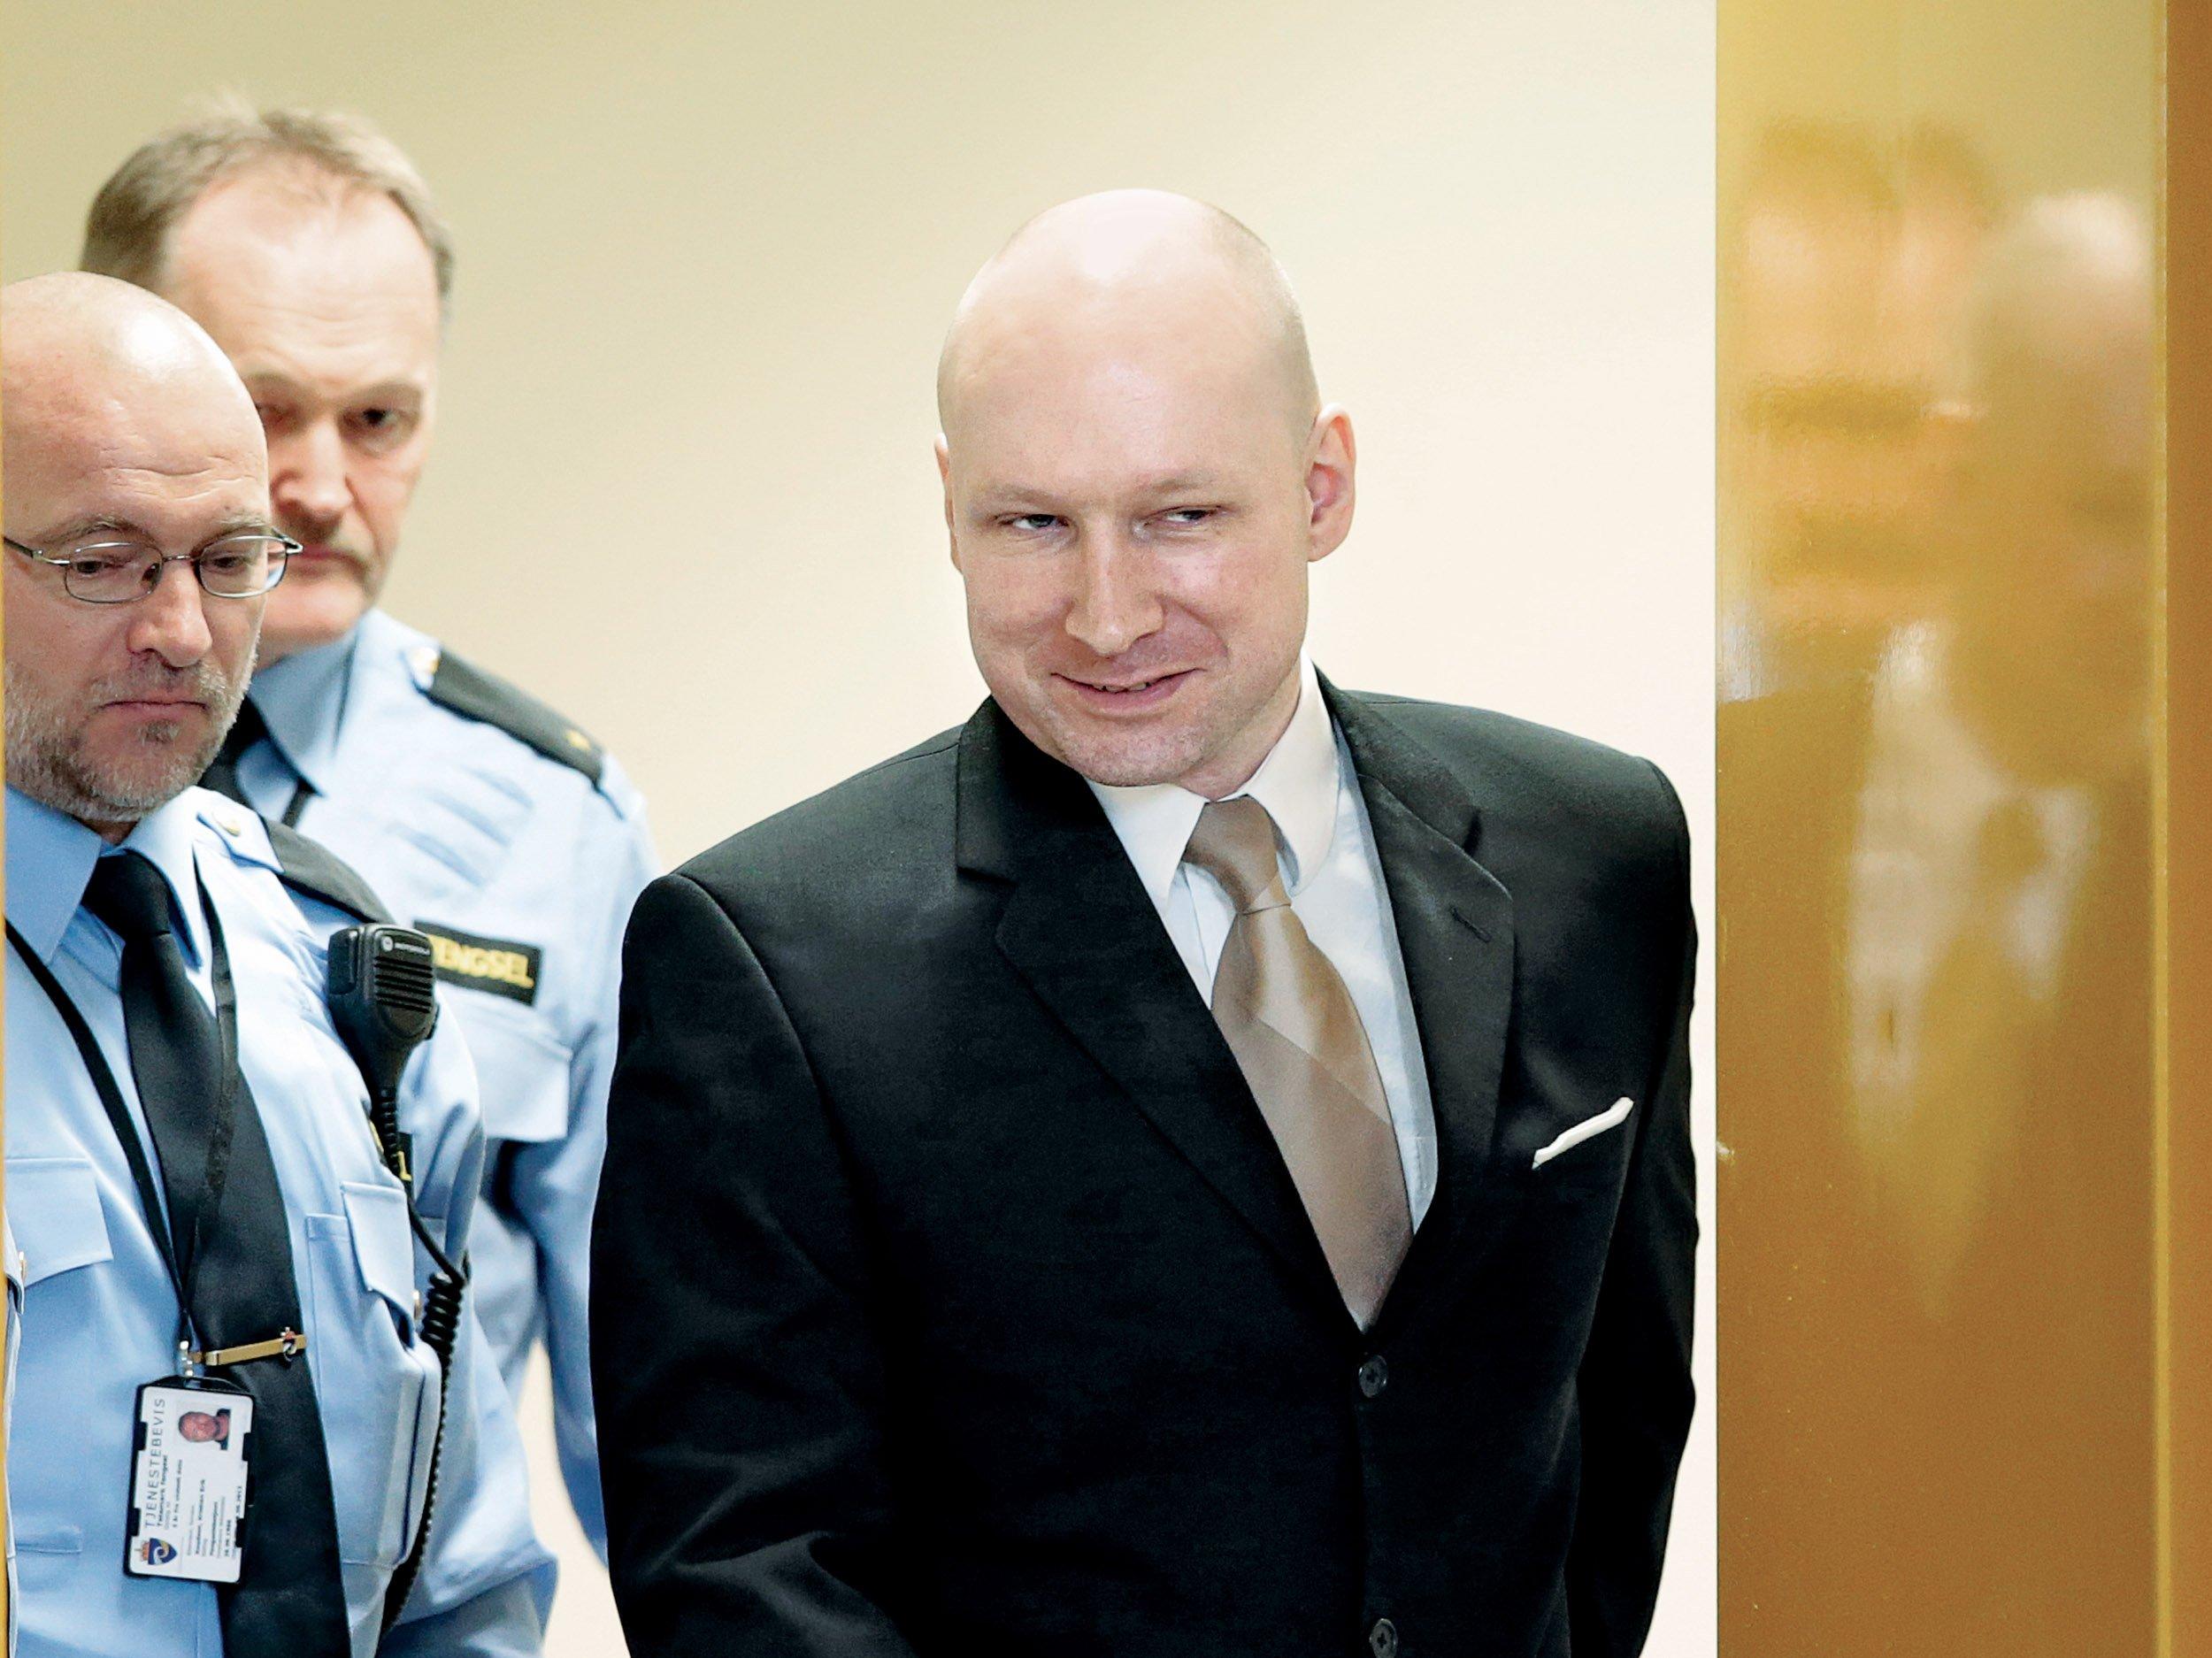 Breivik Photo: Is Norwegian Mass Murderer Anders Breivik Still A Threat